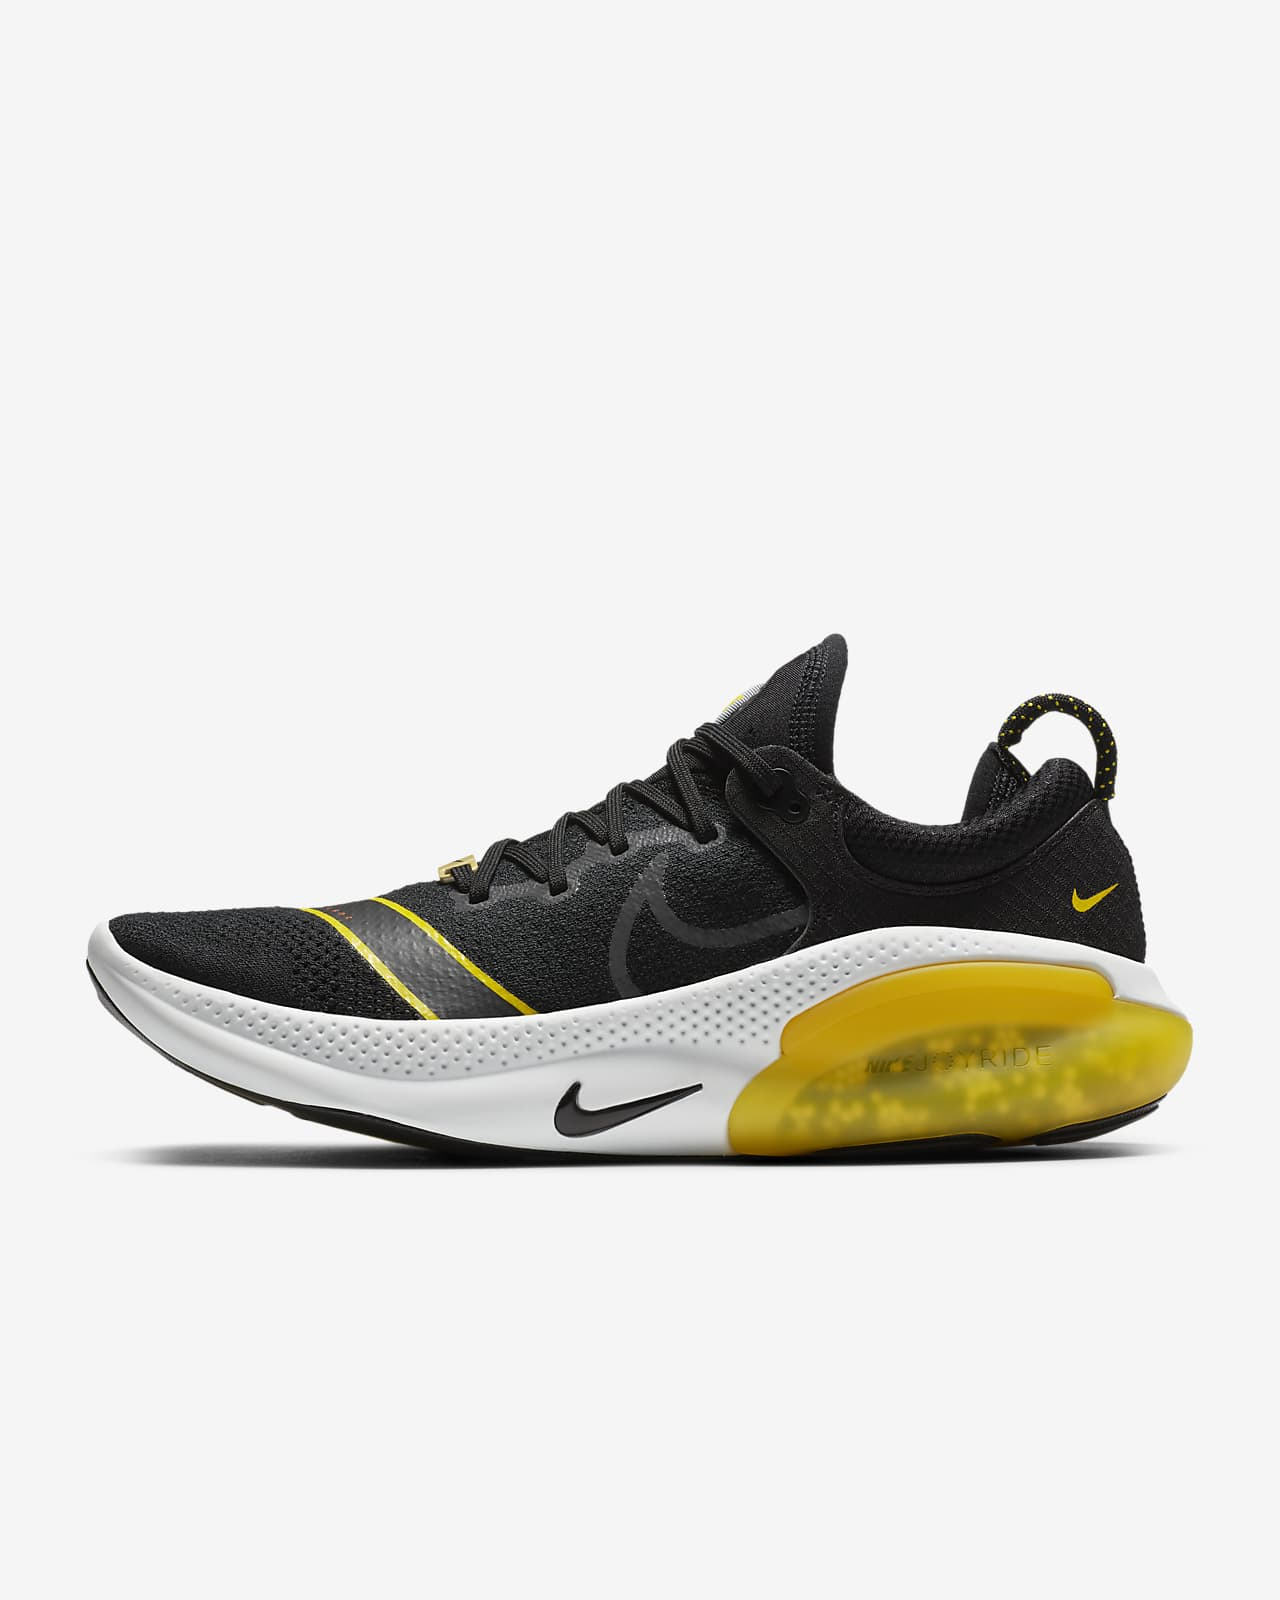 "Calzado de running para hombre Nike Joyride Run Flyknit ""Fast City"""